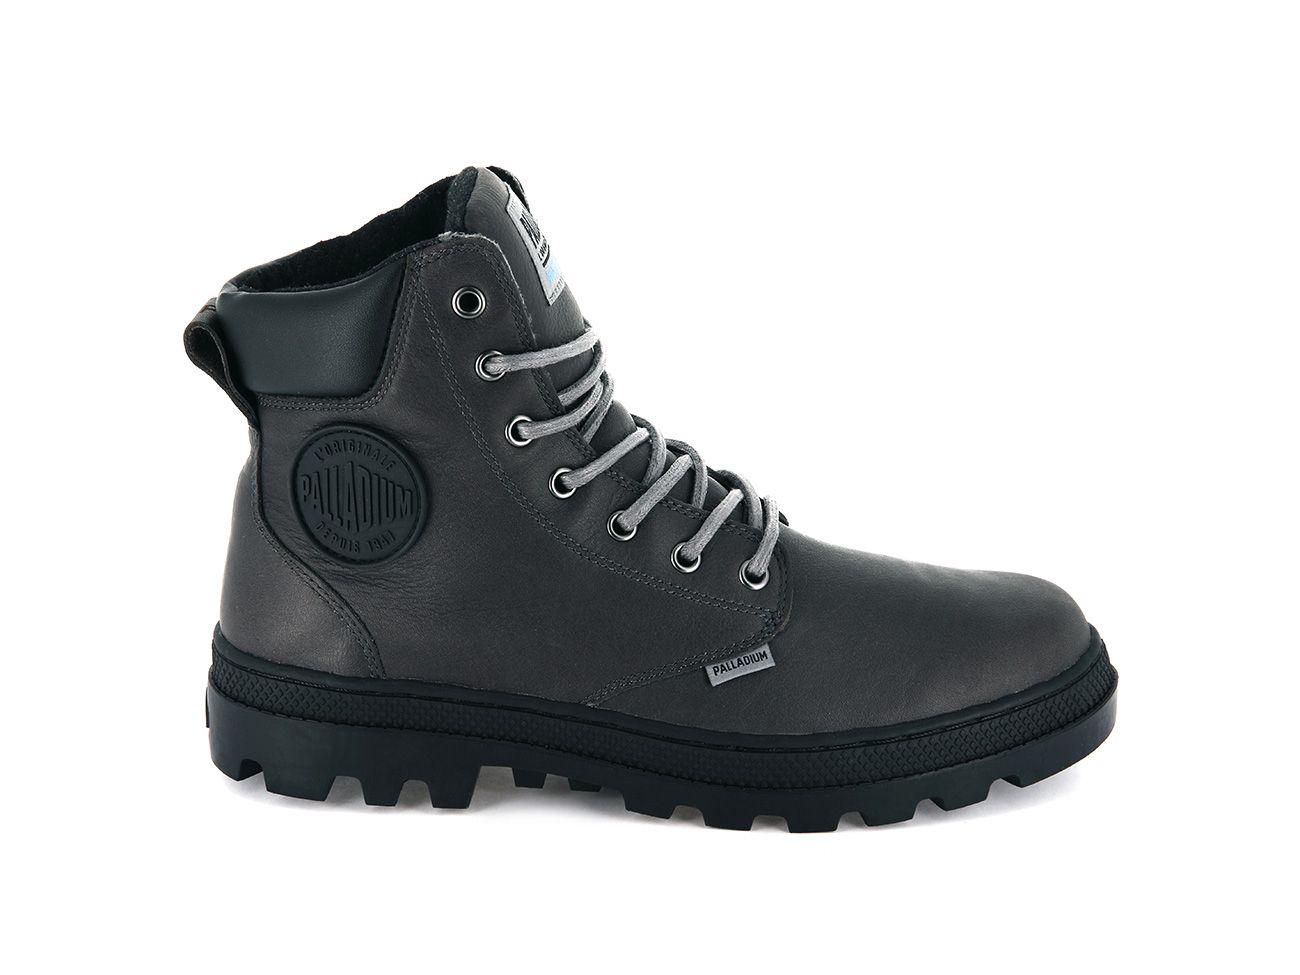 Palladium Pallabosse SC WP Leather in Cloudburst/Black